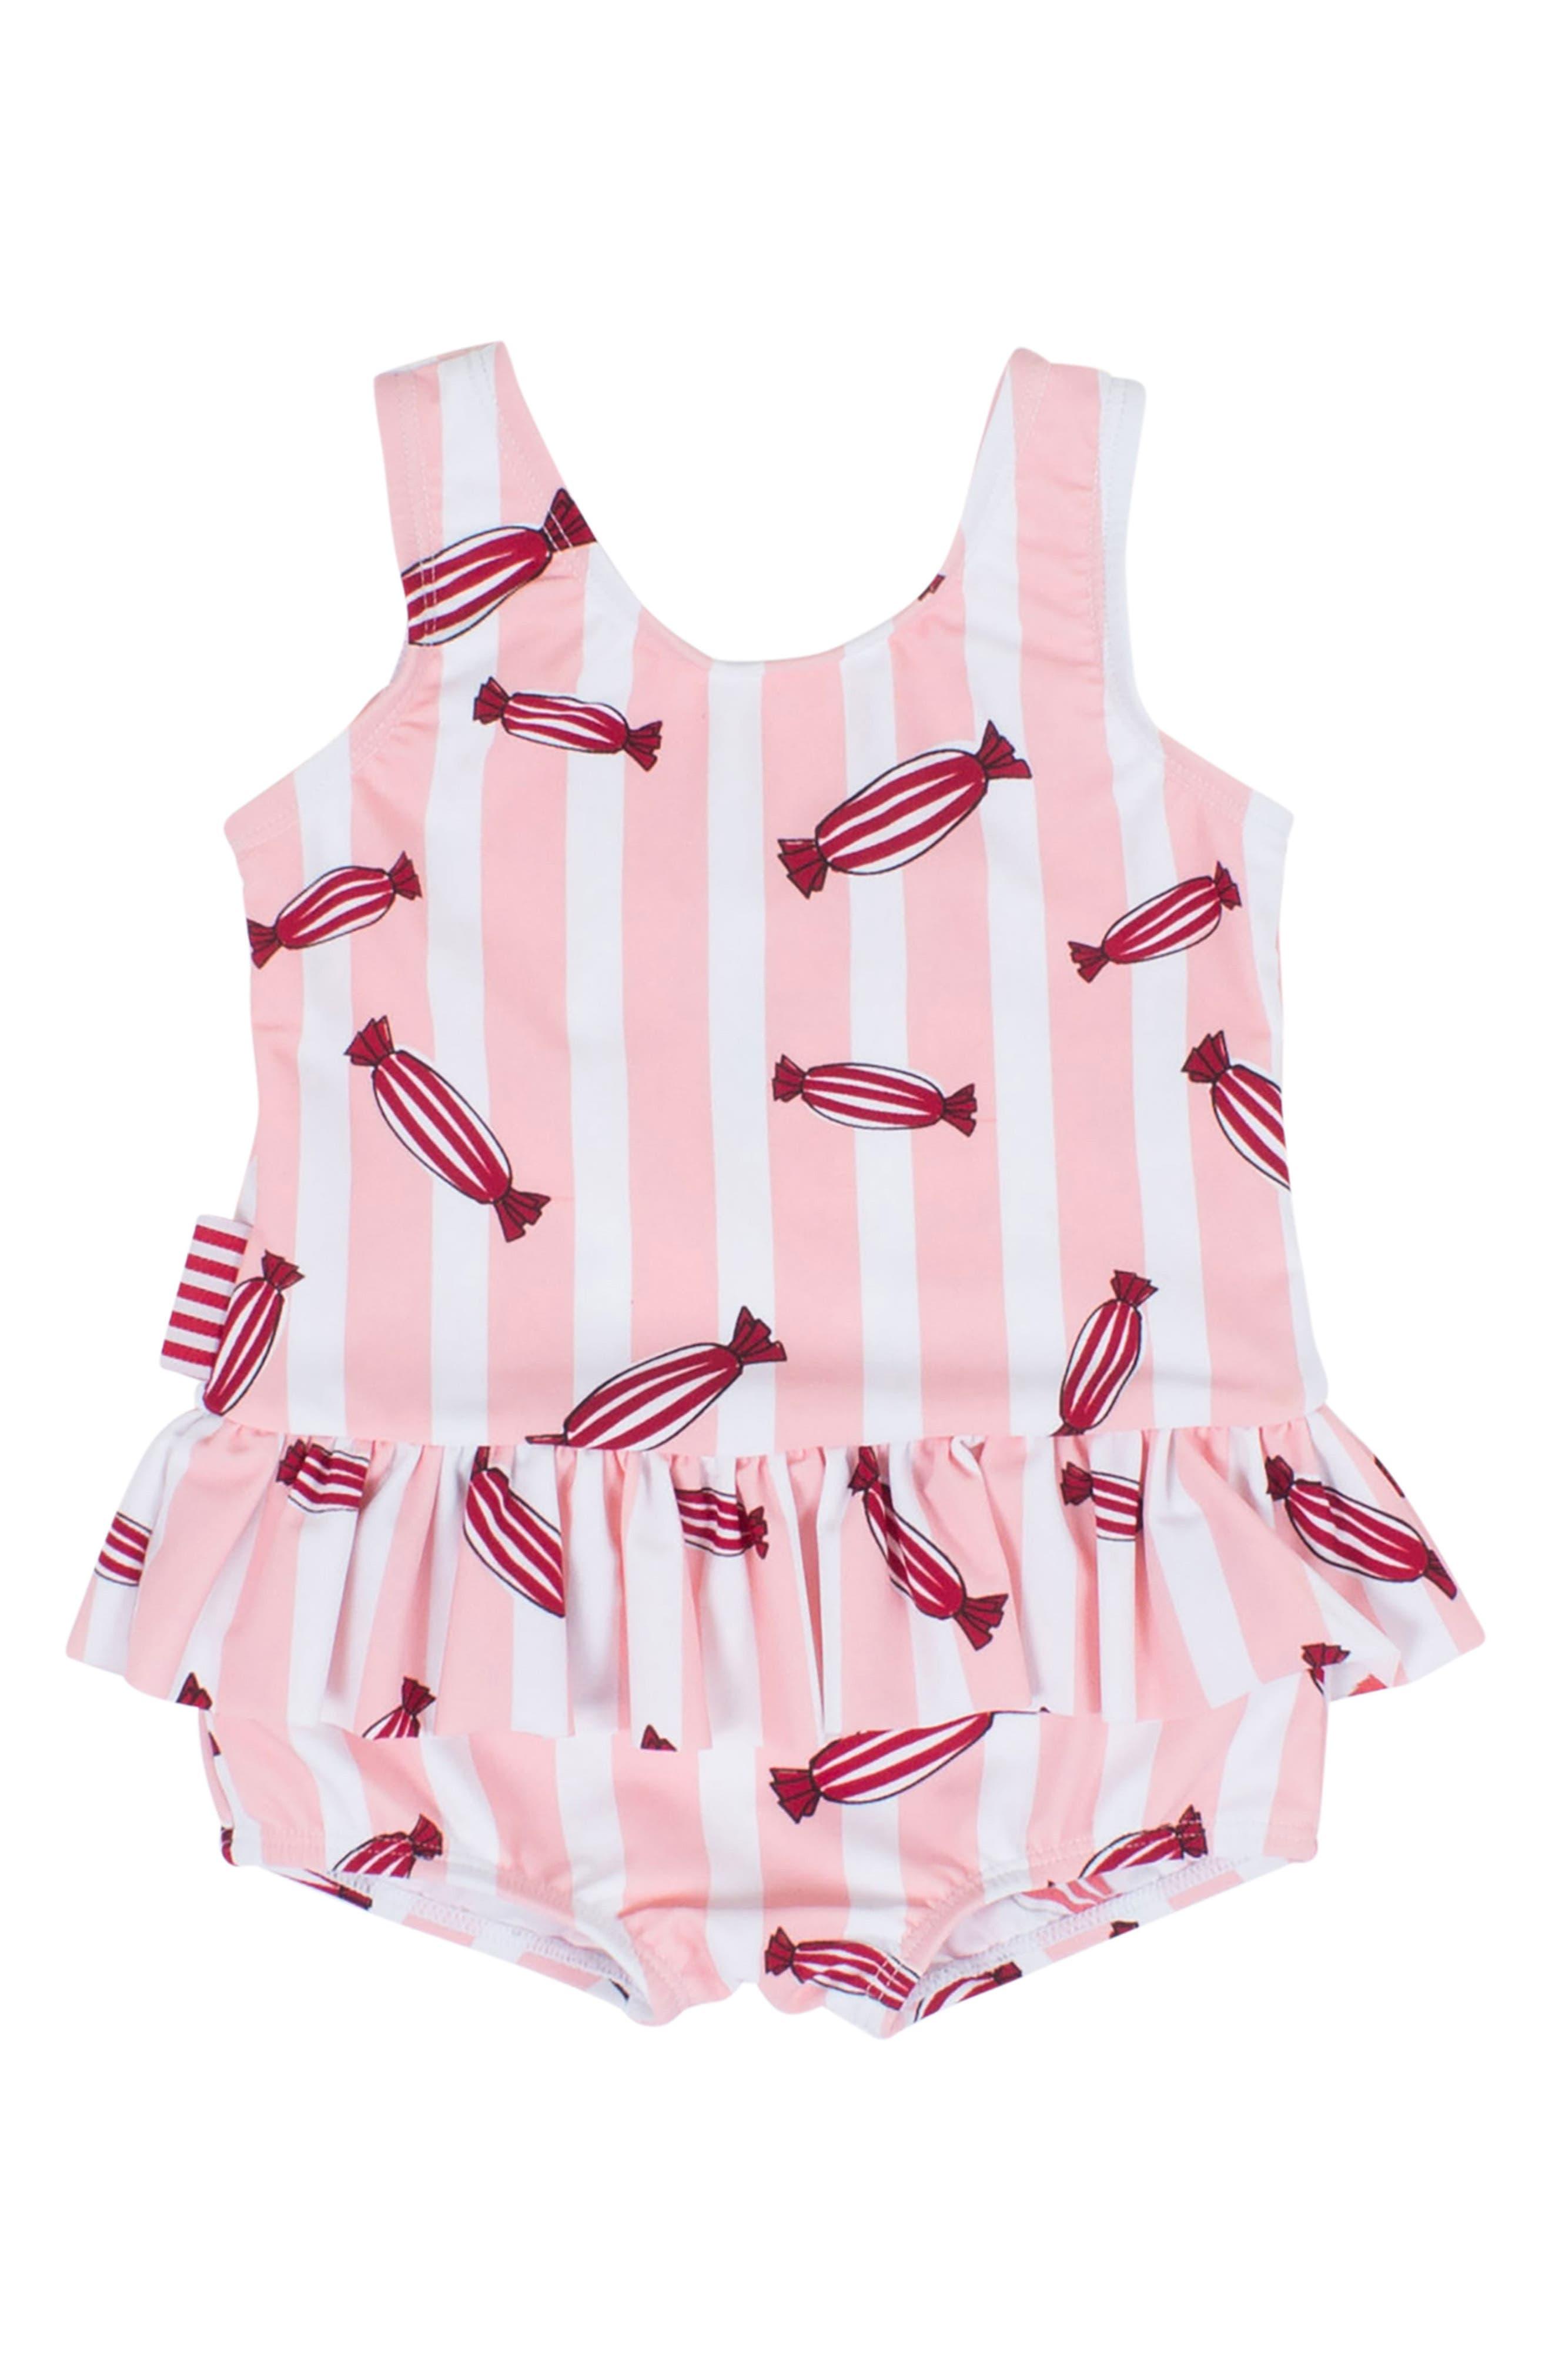 Bonbon Skirted One-Piece Swimsuit,                         Main,                         color,